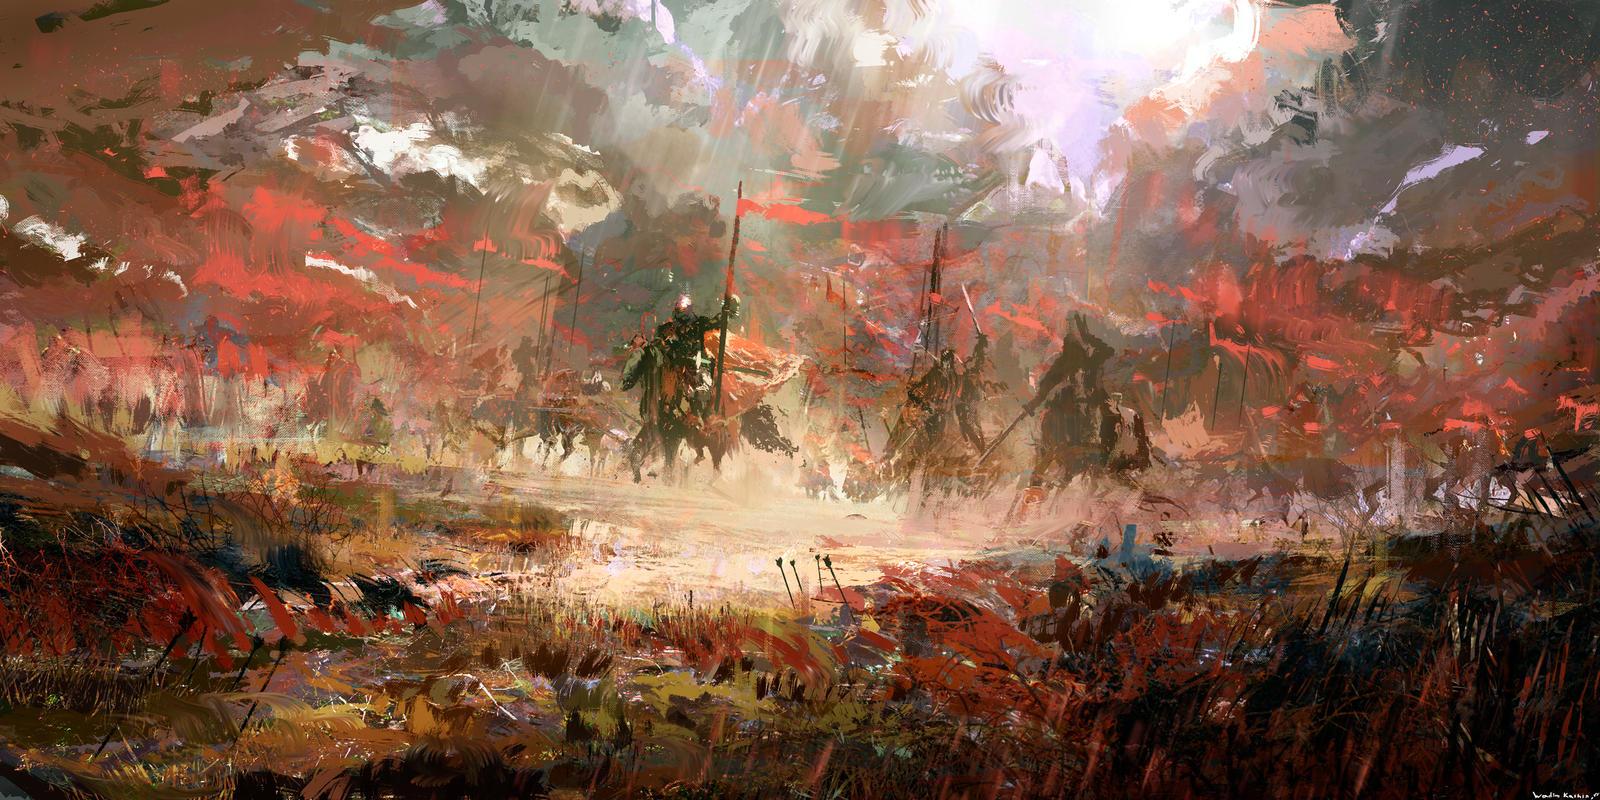 medieval_battlefield_by_solarsouth_d974ln9-fullview.jpg